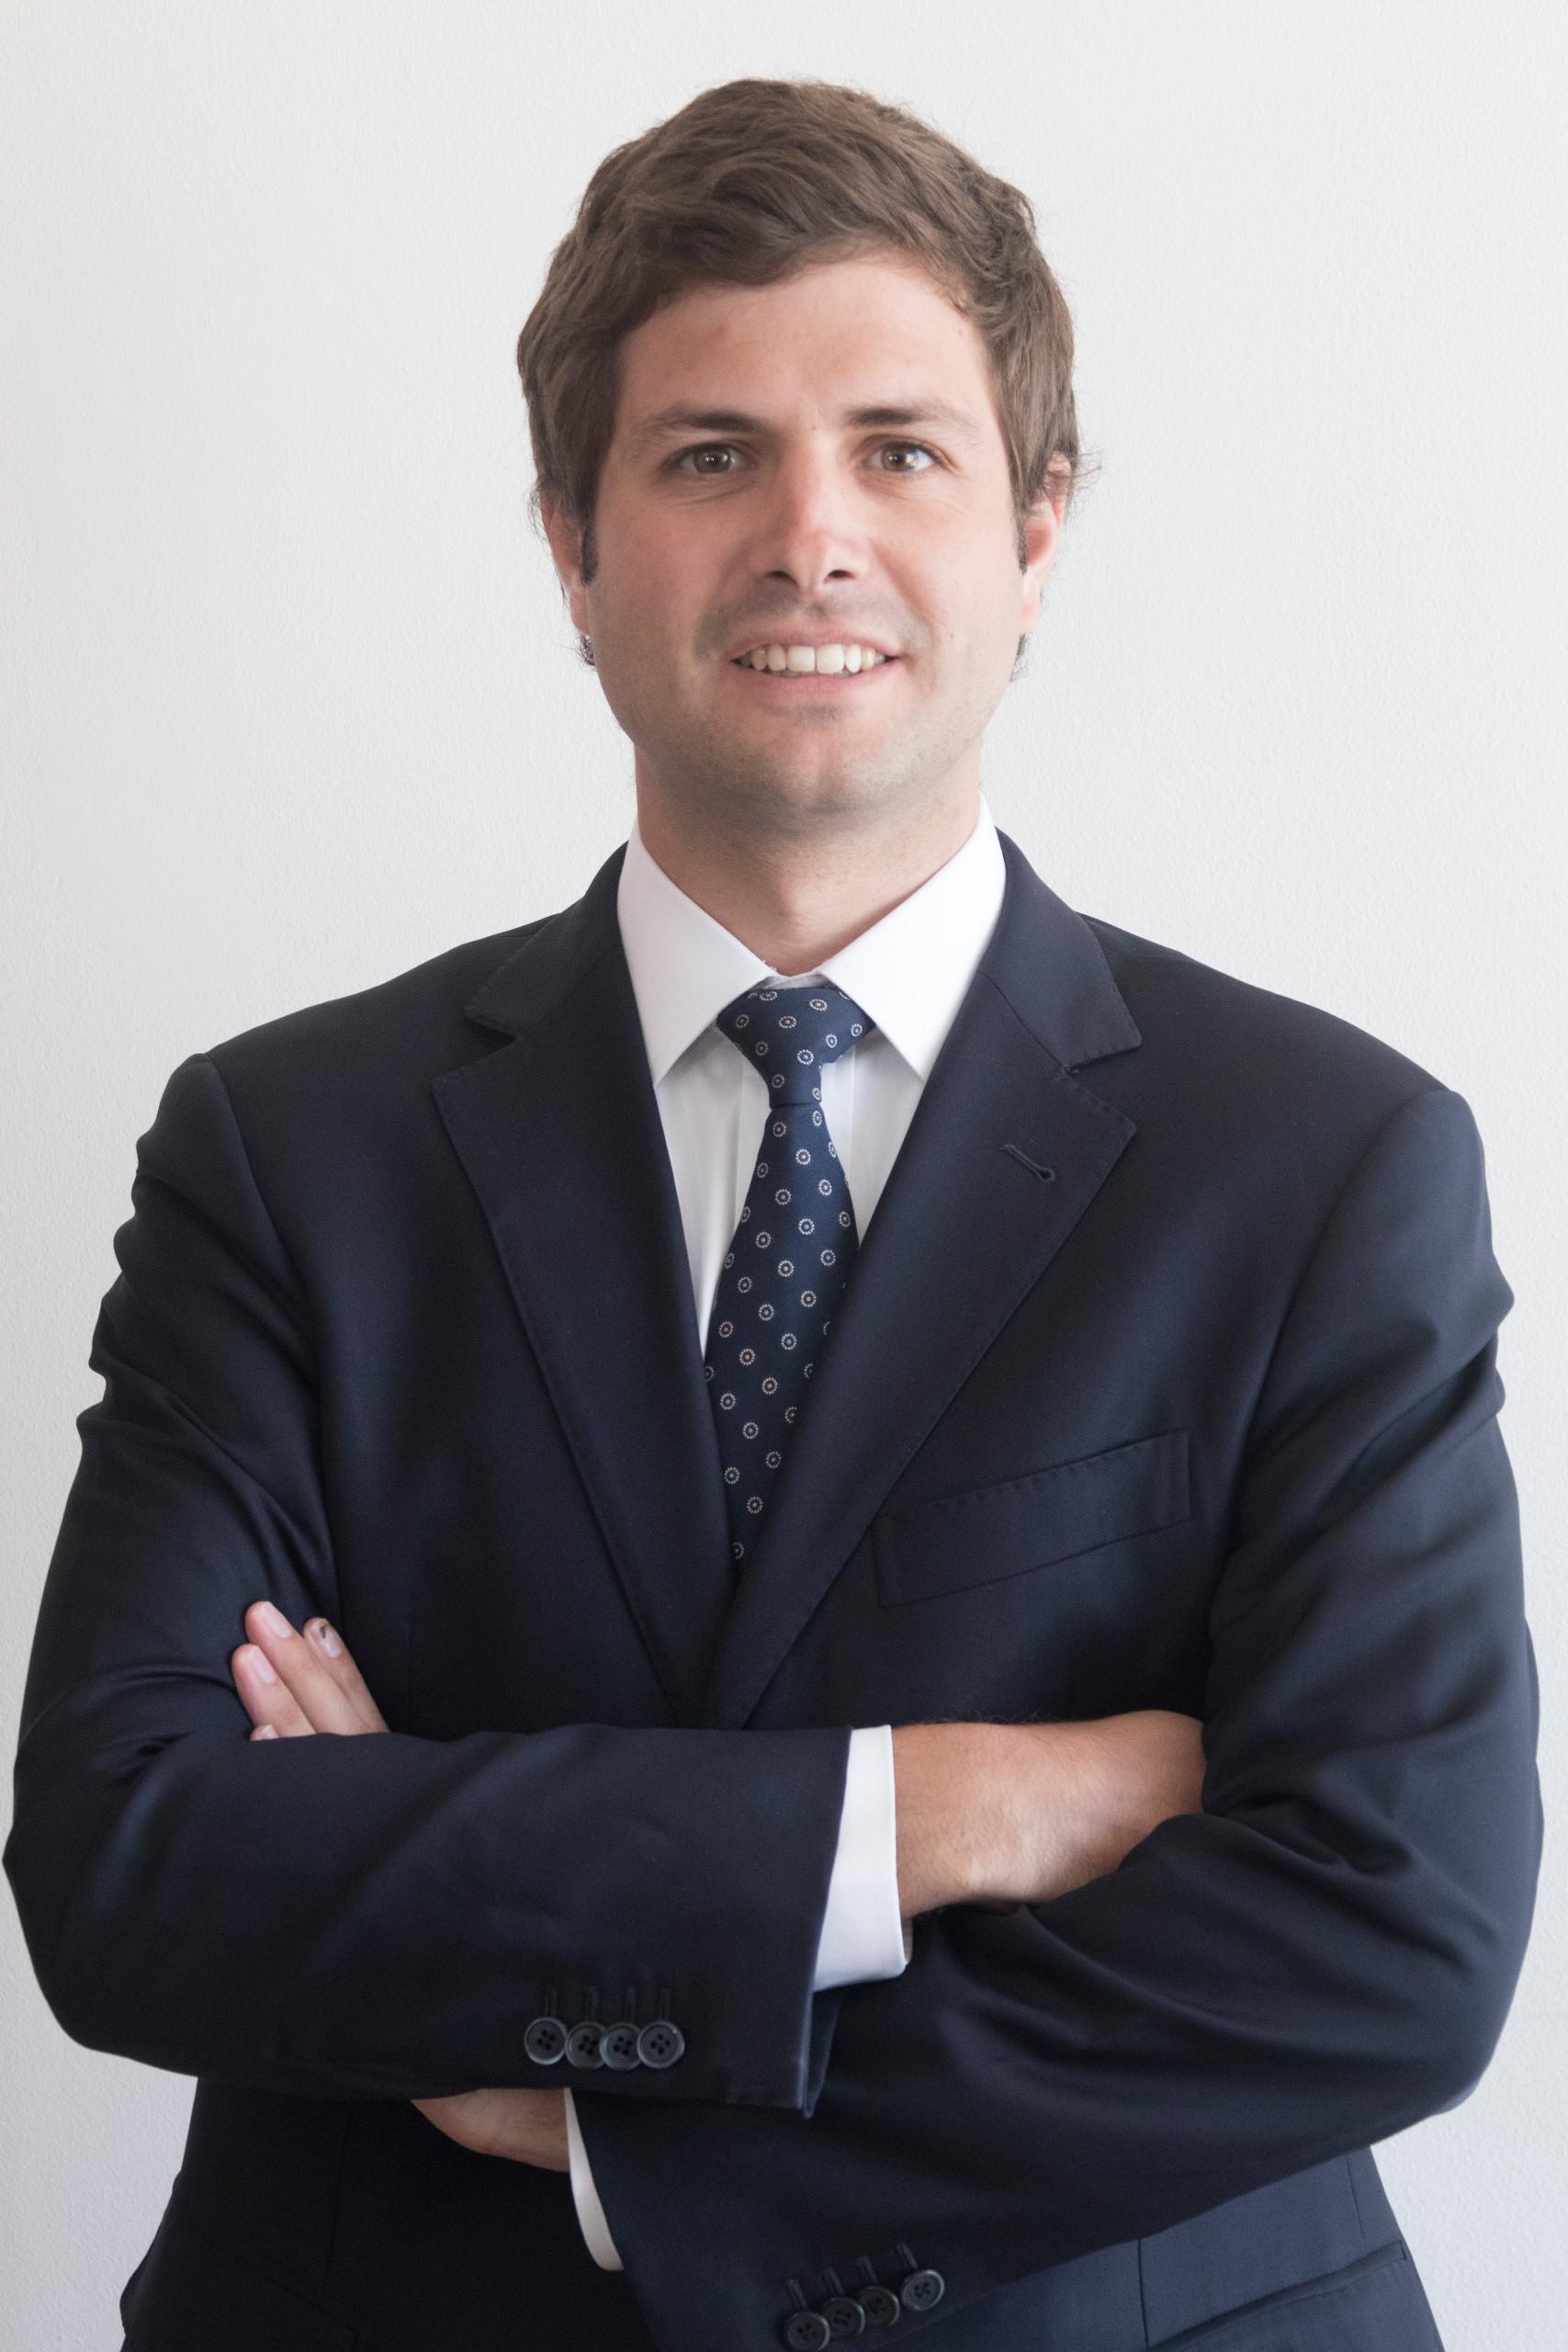 Ignacio Ureta